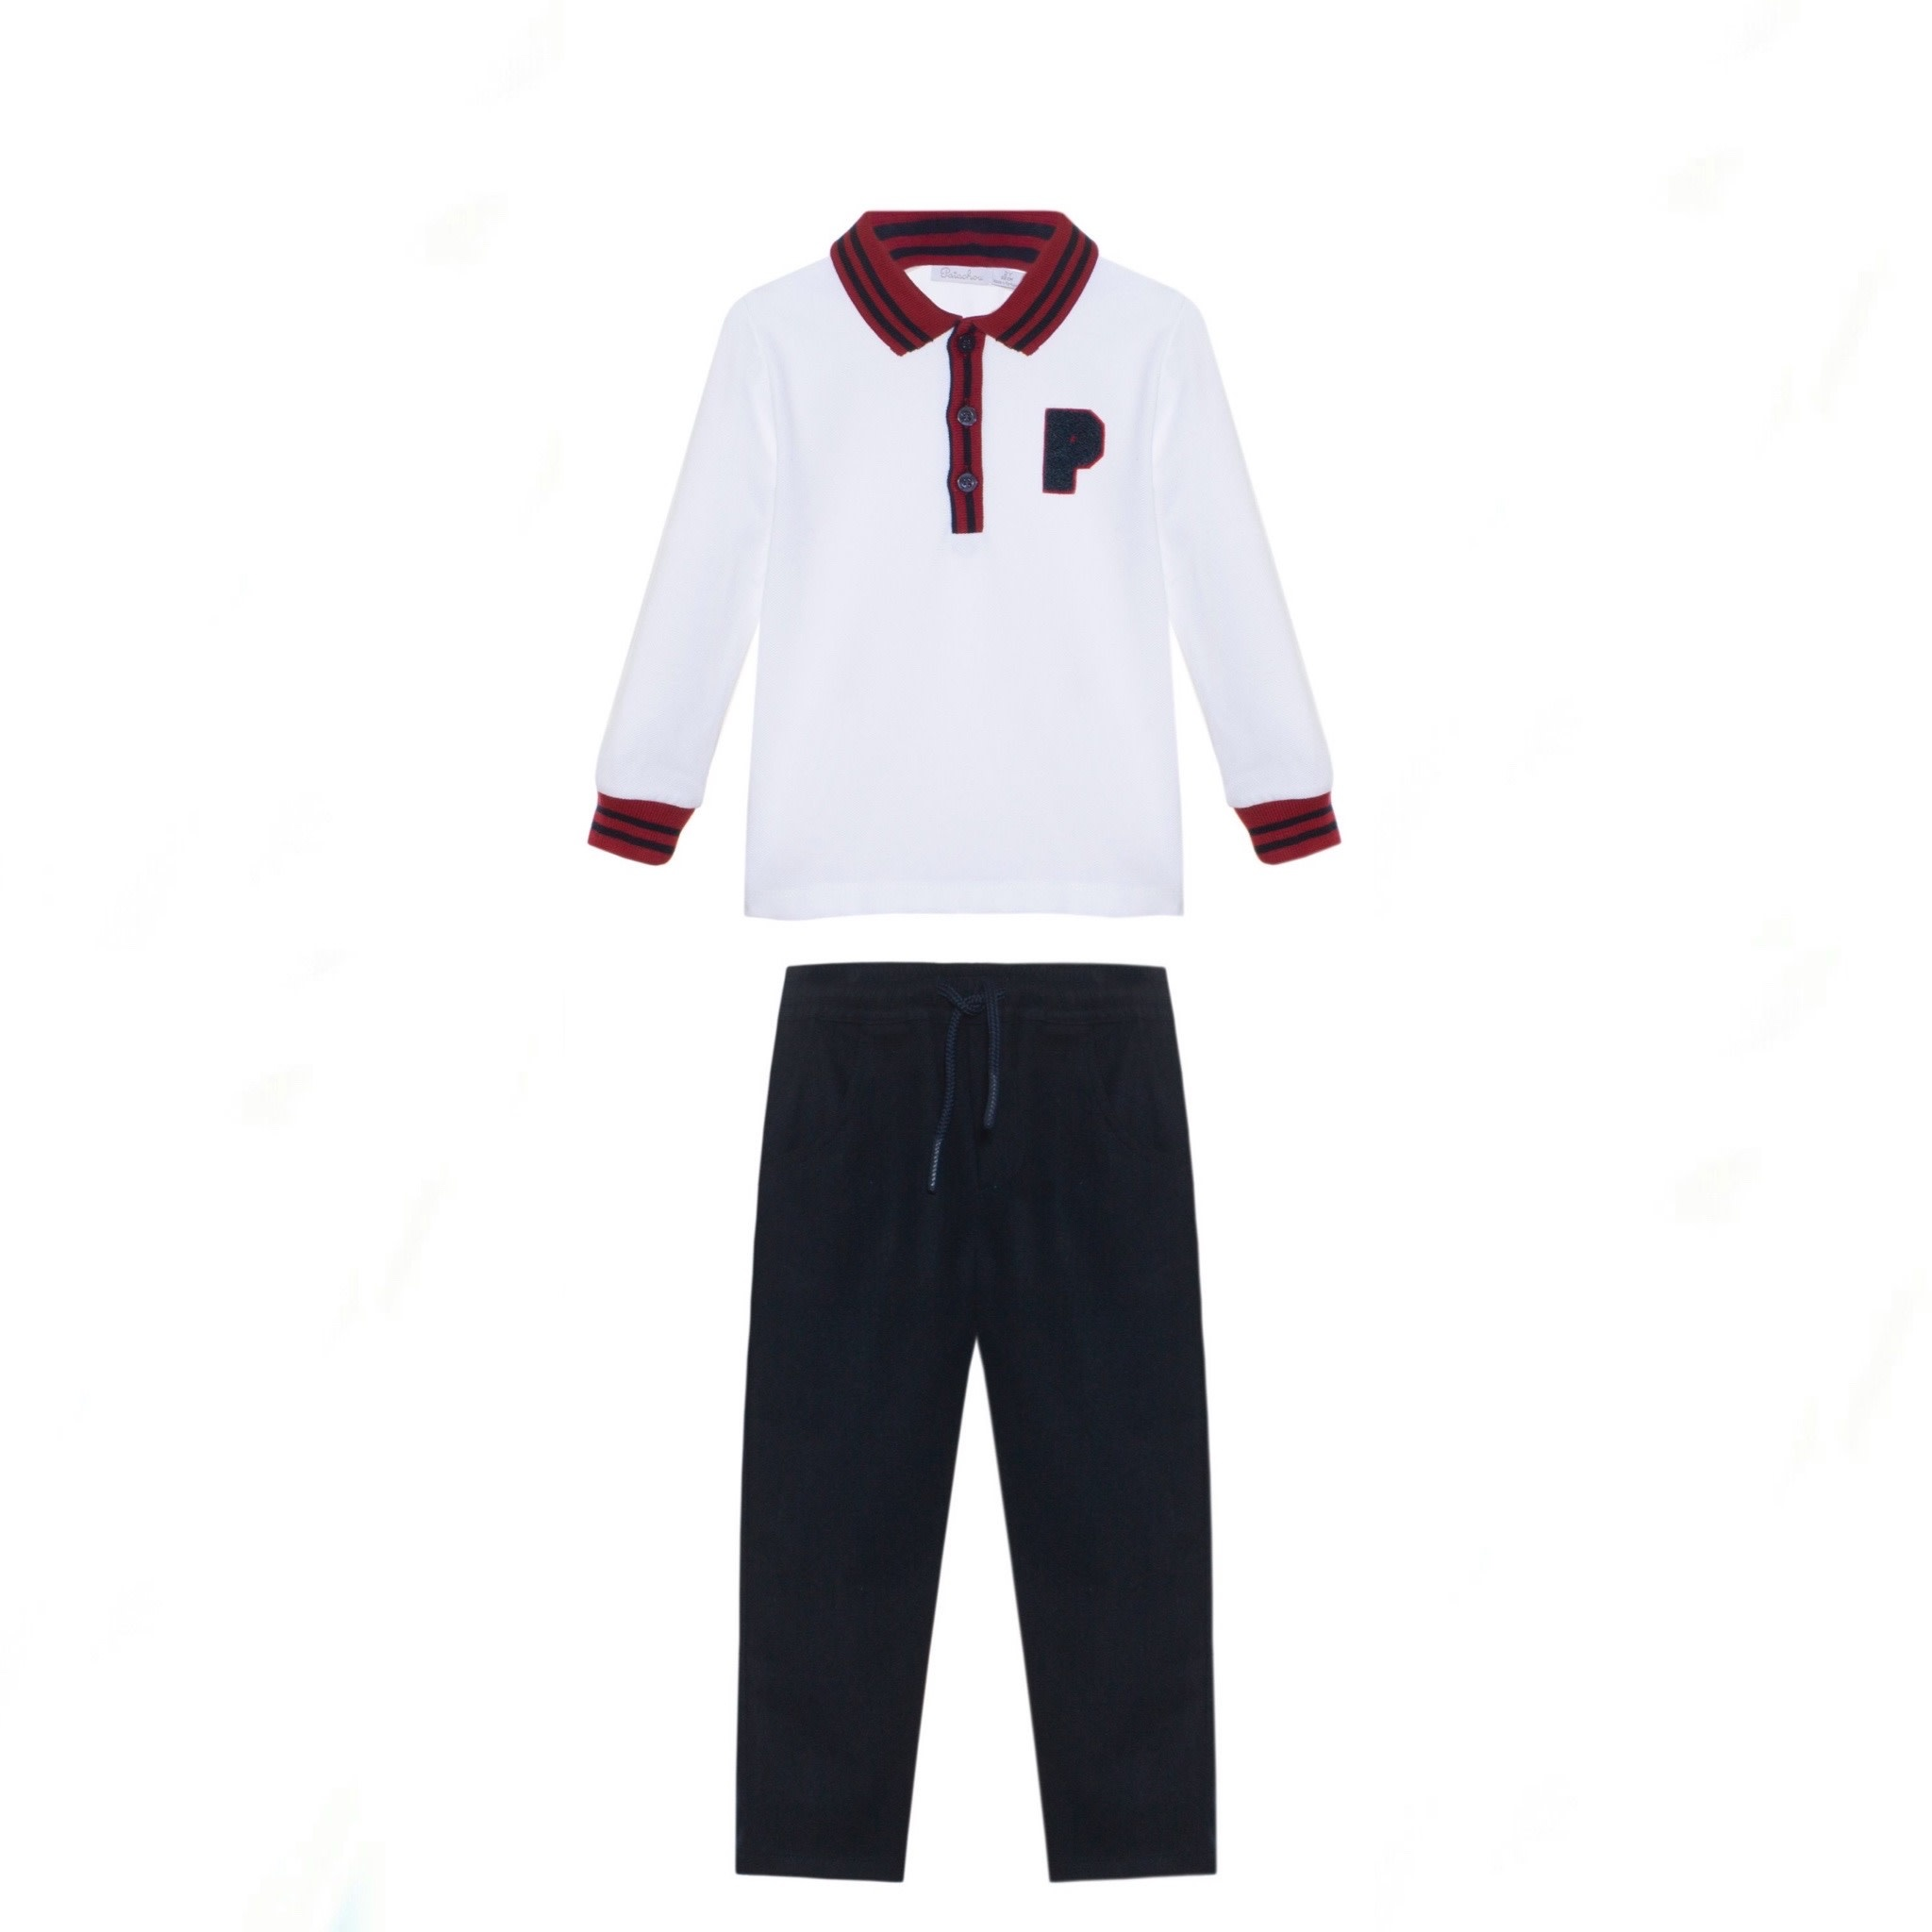 Patachou Patachou P Polo Shirt And Trouser Set